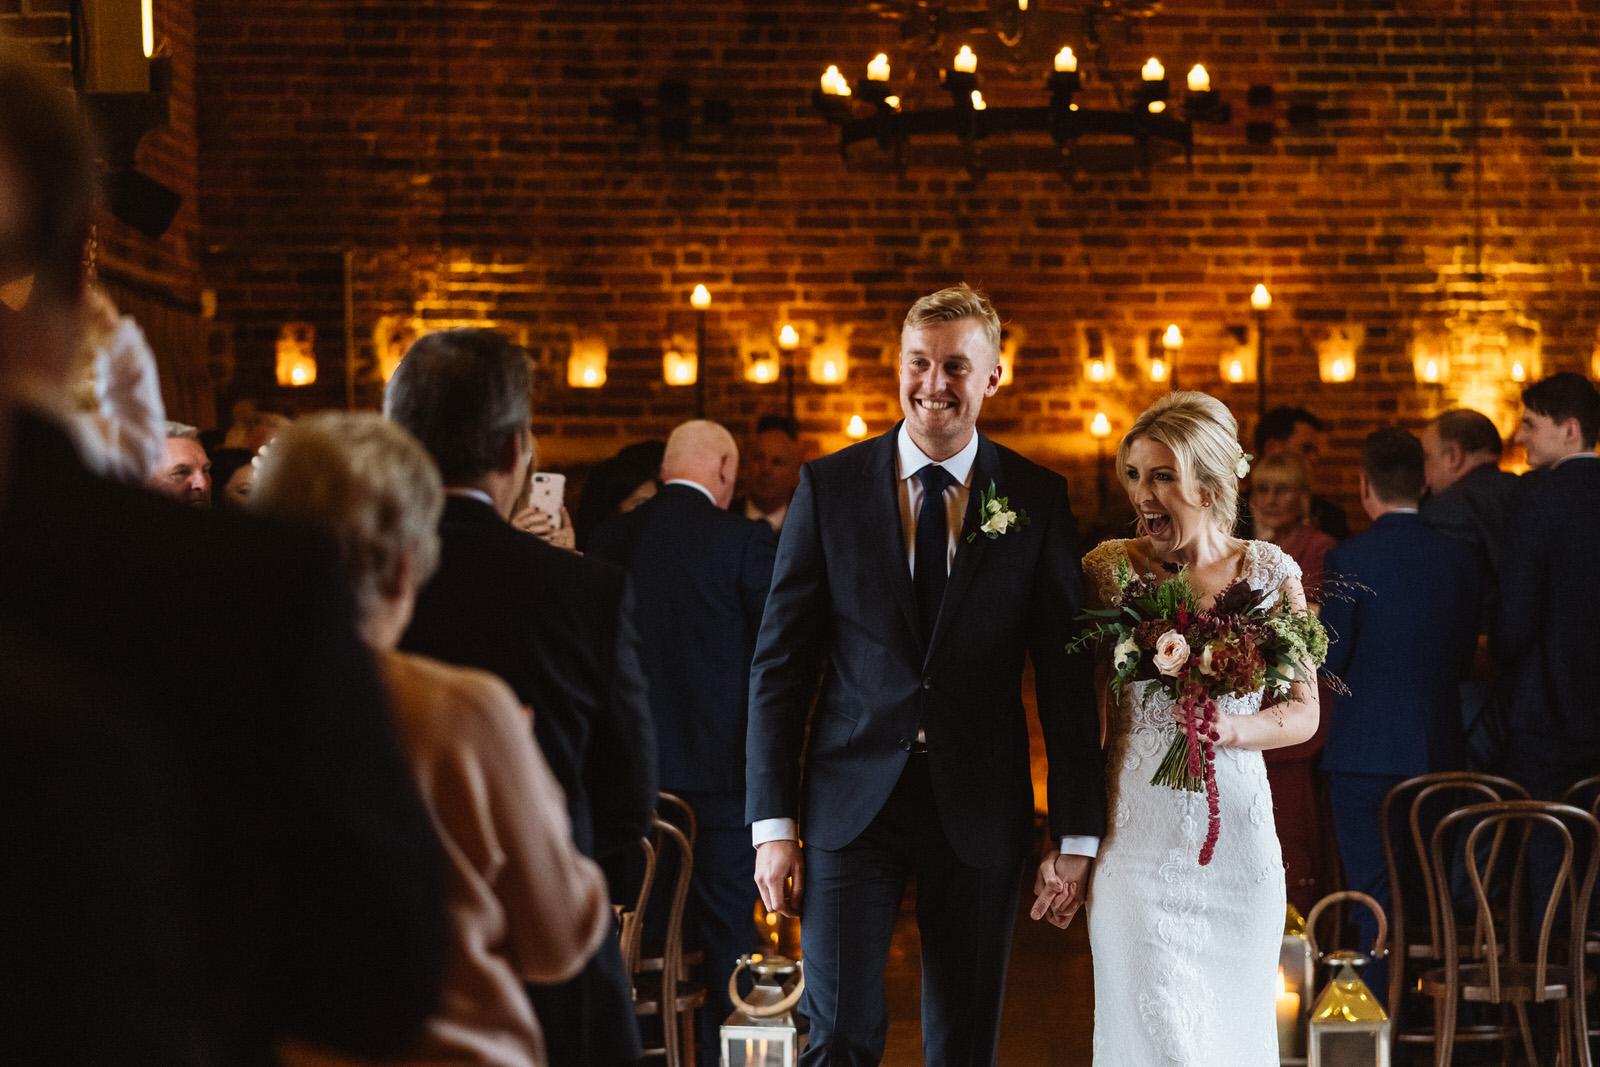 Hazel Gap Barn - Dan Hughes photography - Hayley & Henry - Nov.18-203-The Ceremonyhazel+gap+nottinghamshire+wedding+venue.jpg